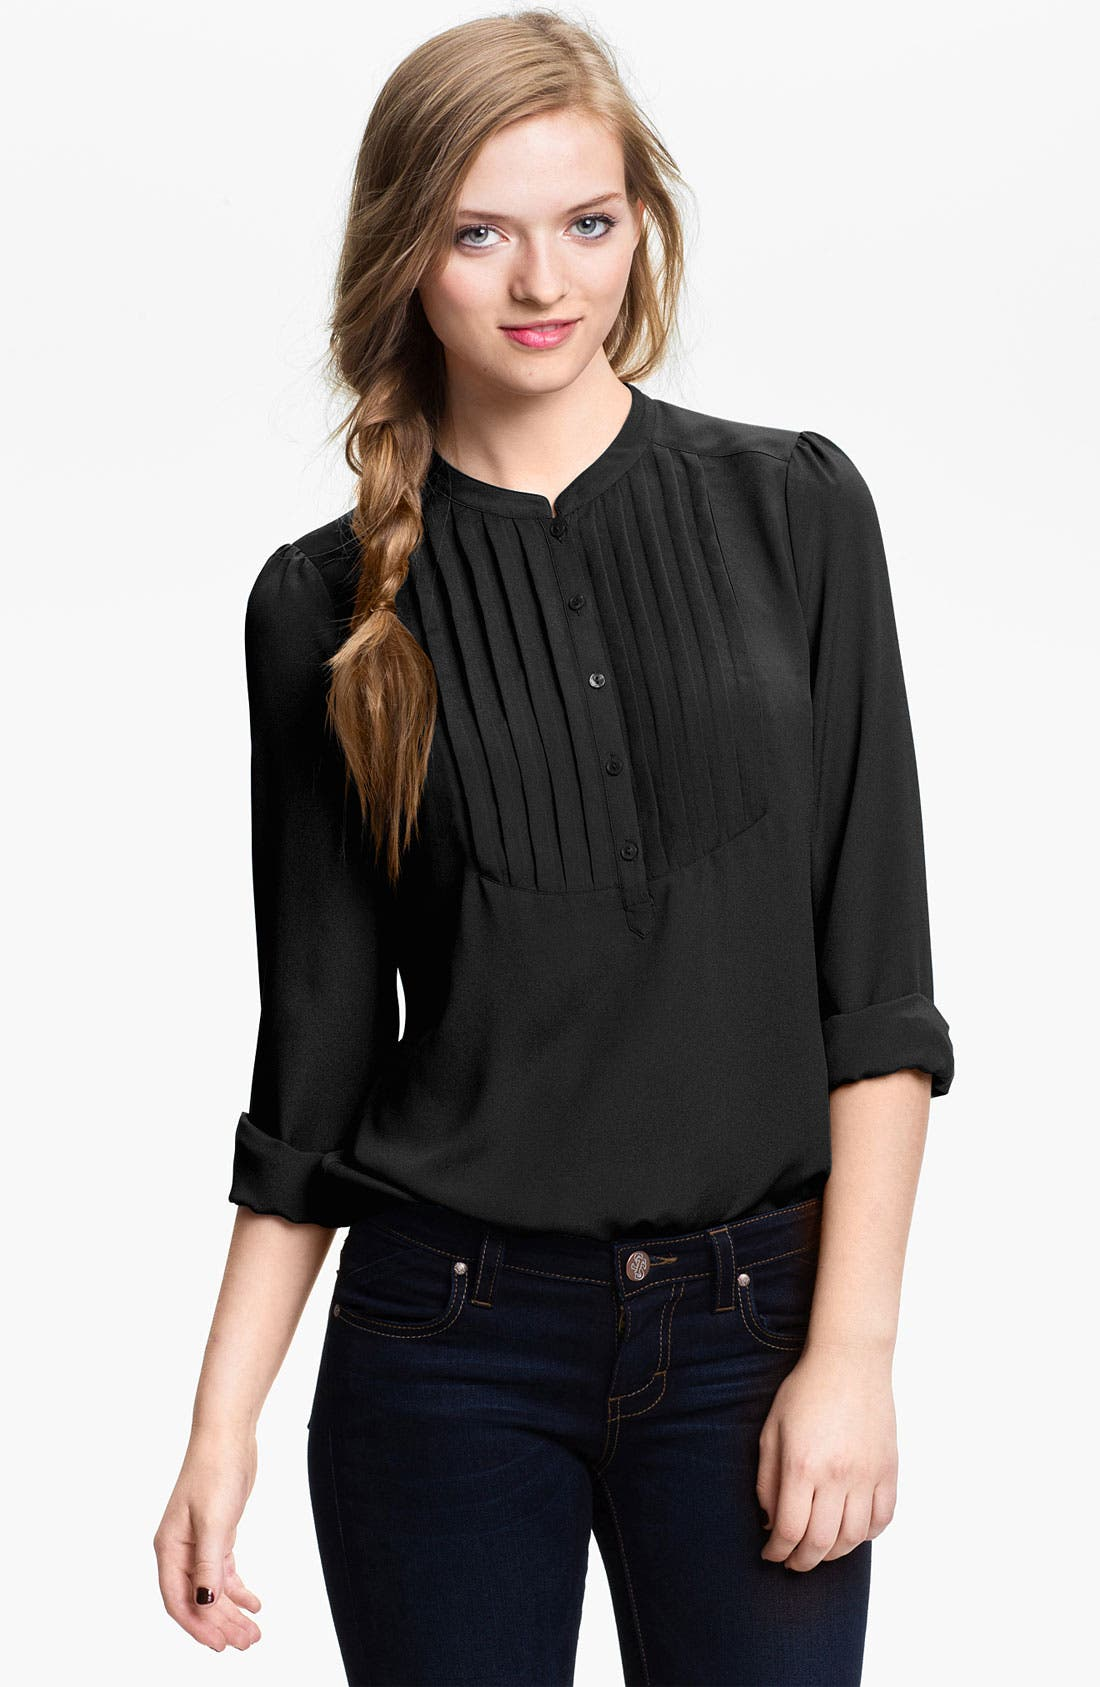 Alternate Image 1 Selected - BP. Tuxedo Shirt (Juniors)